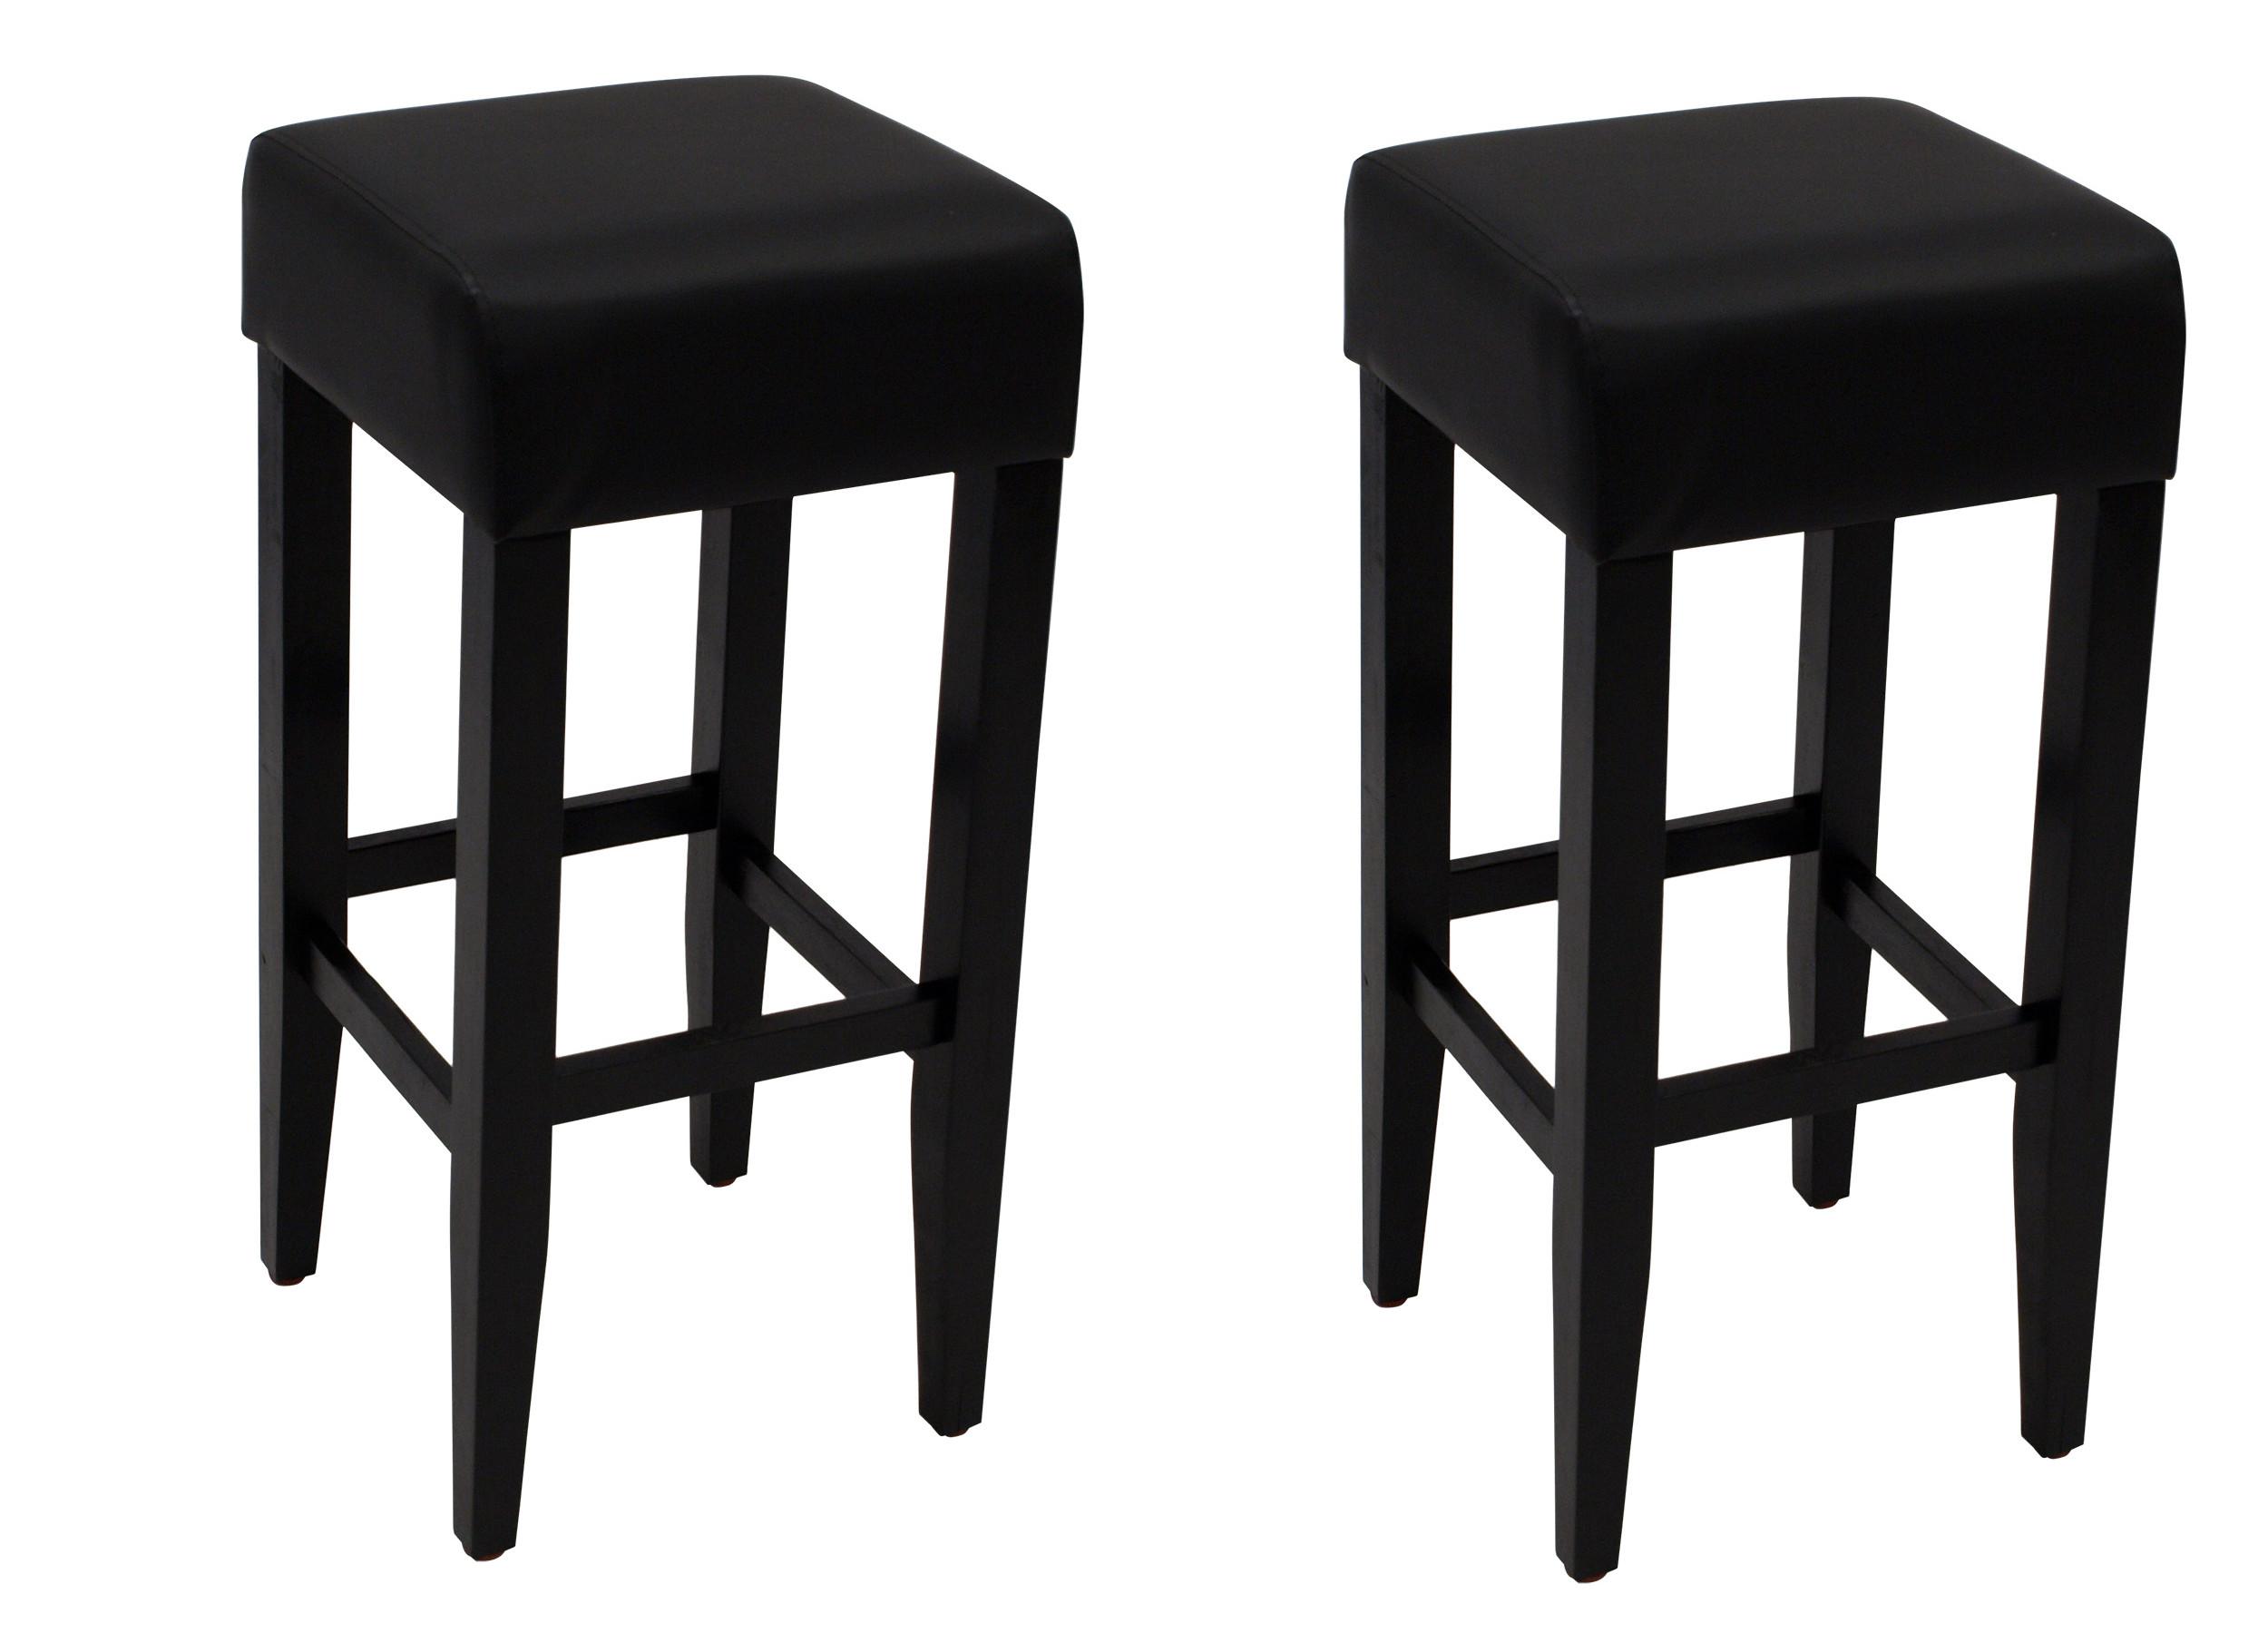 Barhocker BODEGA, Gestell Akazienholz schwarz, Sitz Kunstleder schwarz, 2 Stück, FSC®-zertifiziert